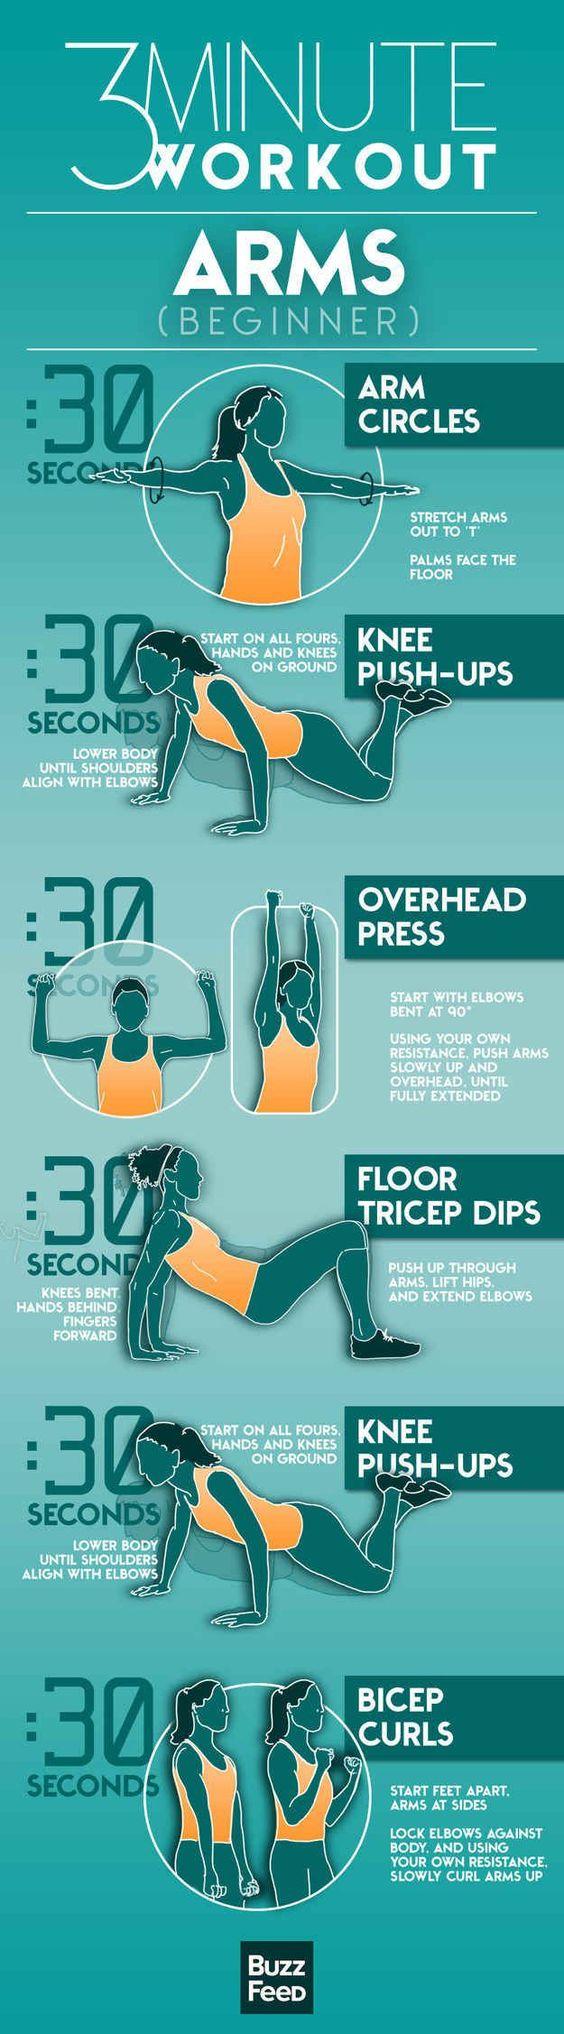 23 Fat Burning Bikini Arm Workouts That Will Shape Your ...